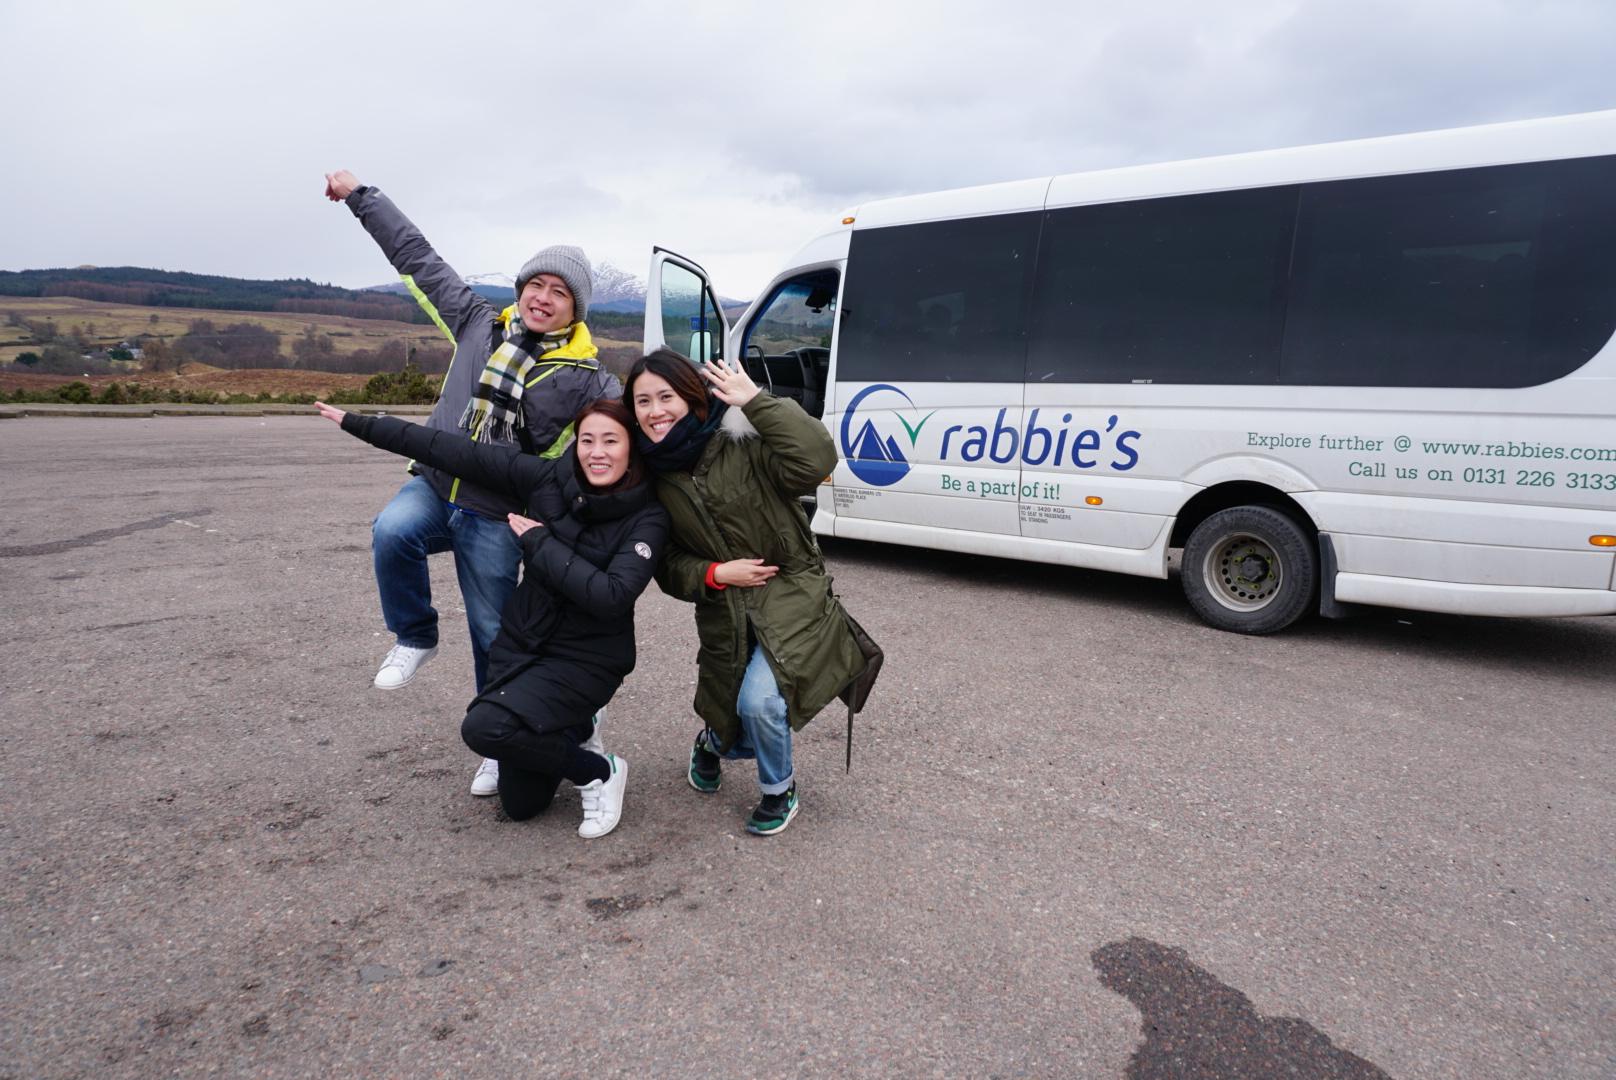 A very good memory, nice tour